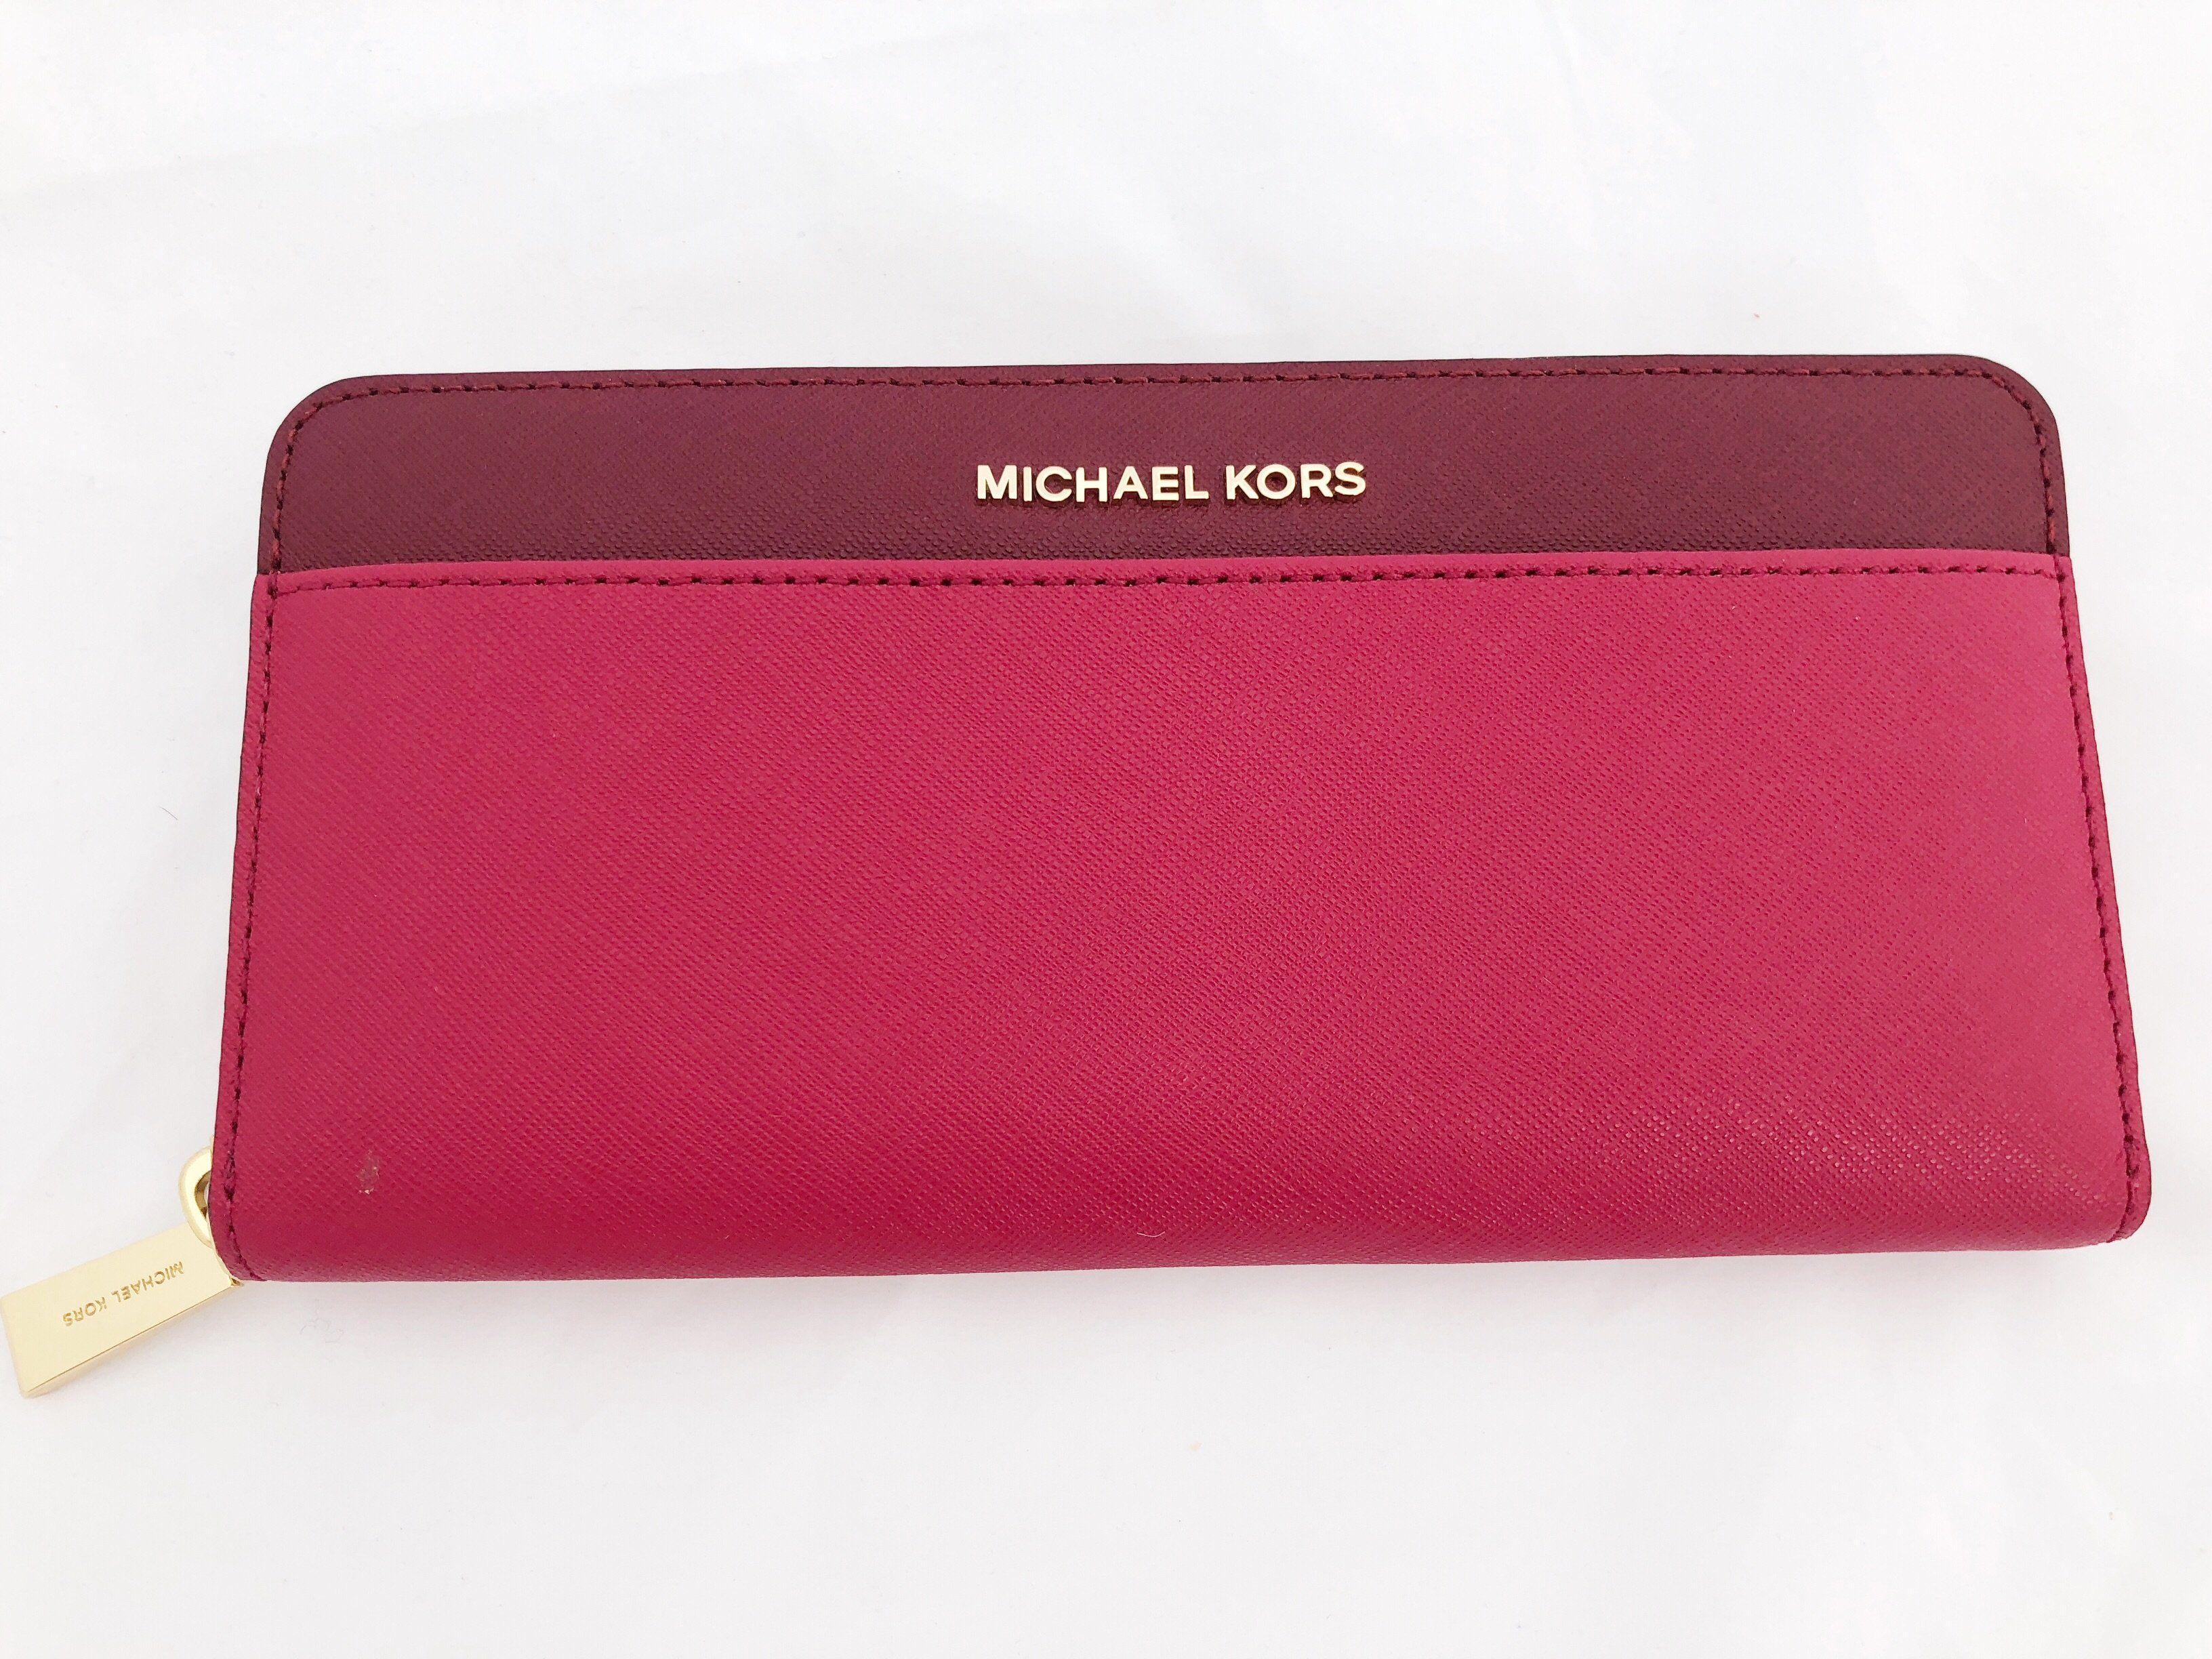 093173da5752cb NWT Michael Kors Money Pieces Pocket Zip Around Continental Leather Wallet  Pink Red #GabysBags #Handbags